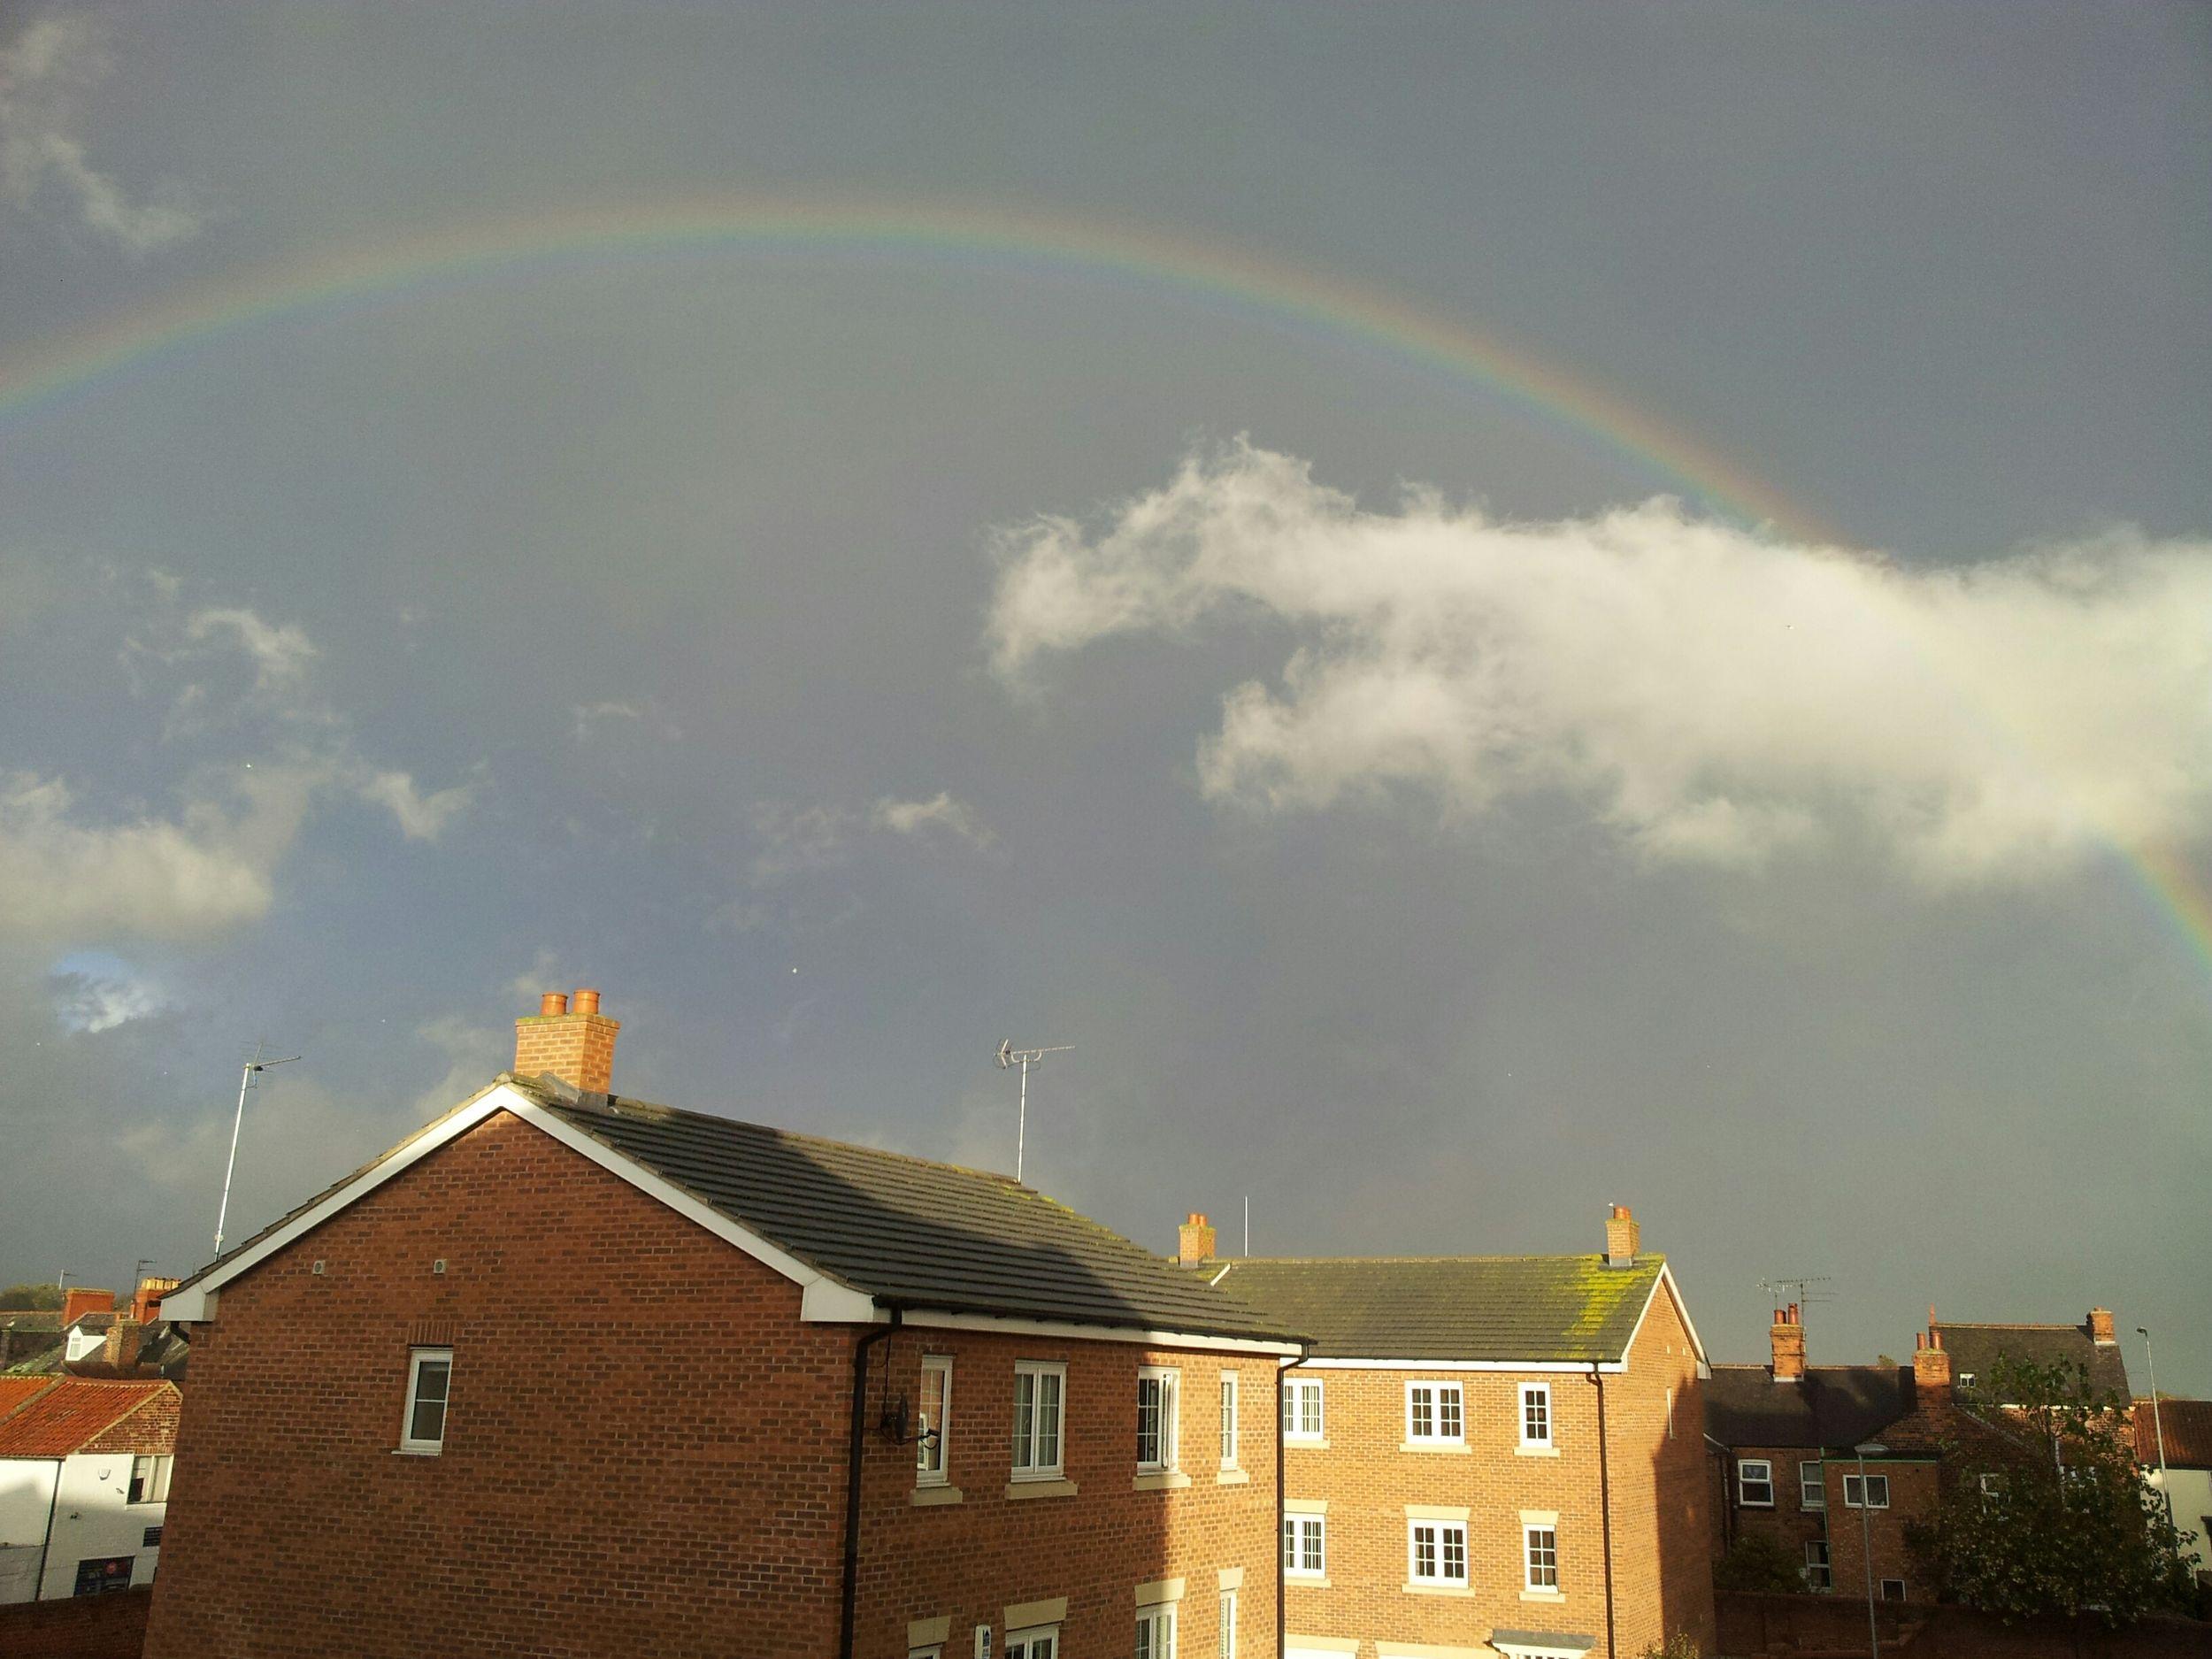 пейзаж радуга небеса весна небо облако моелюбимоенебо русскиеванглии скоровесна бридлингтон